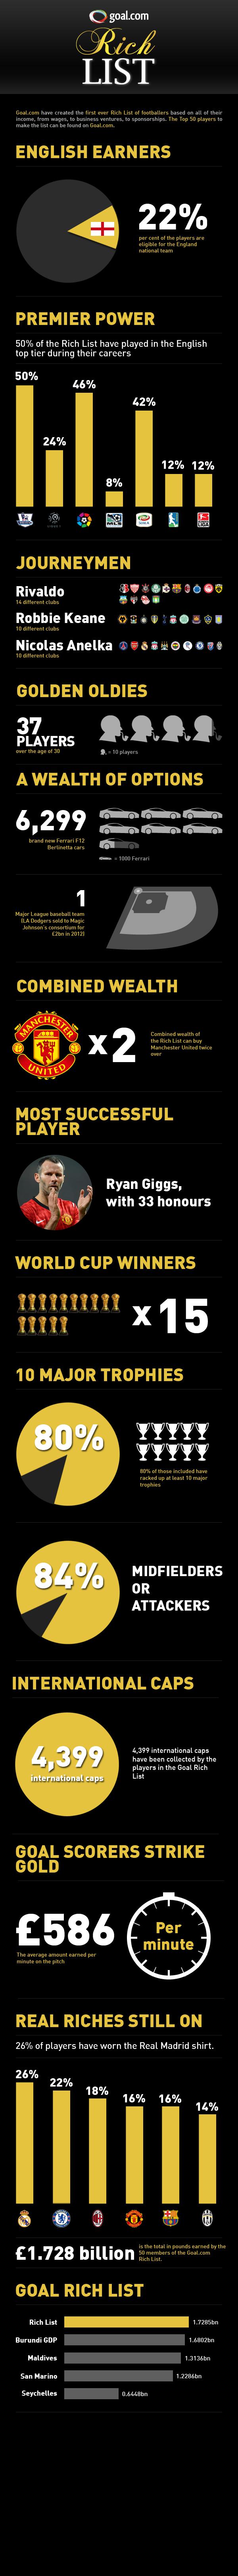 RichList_infographic